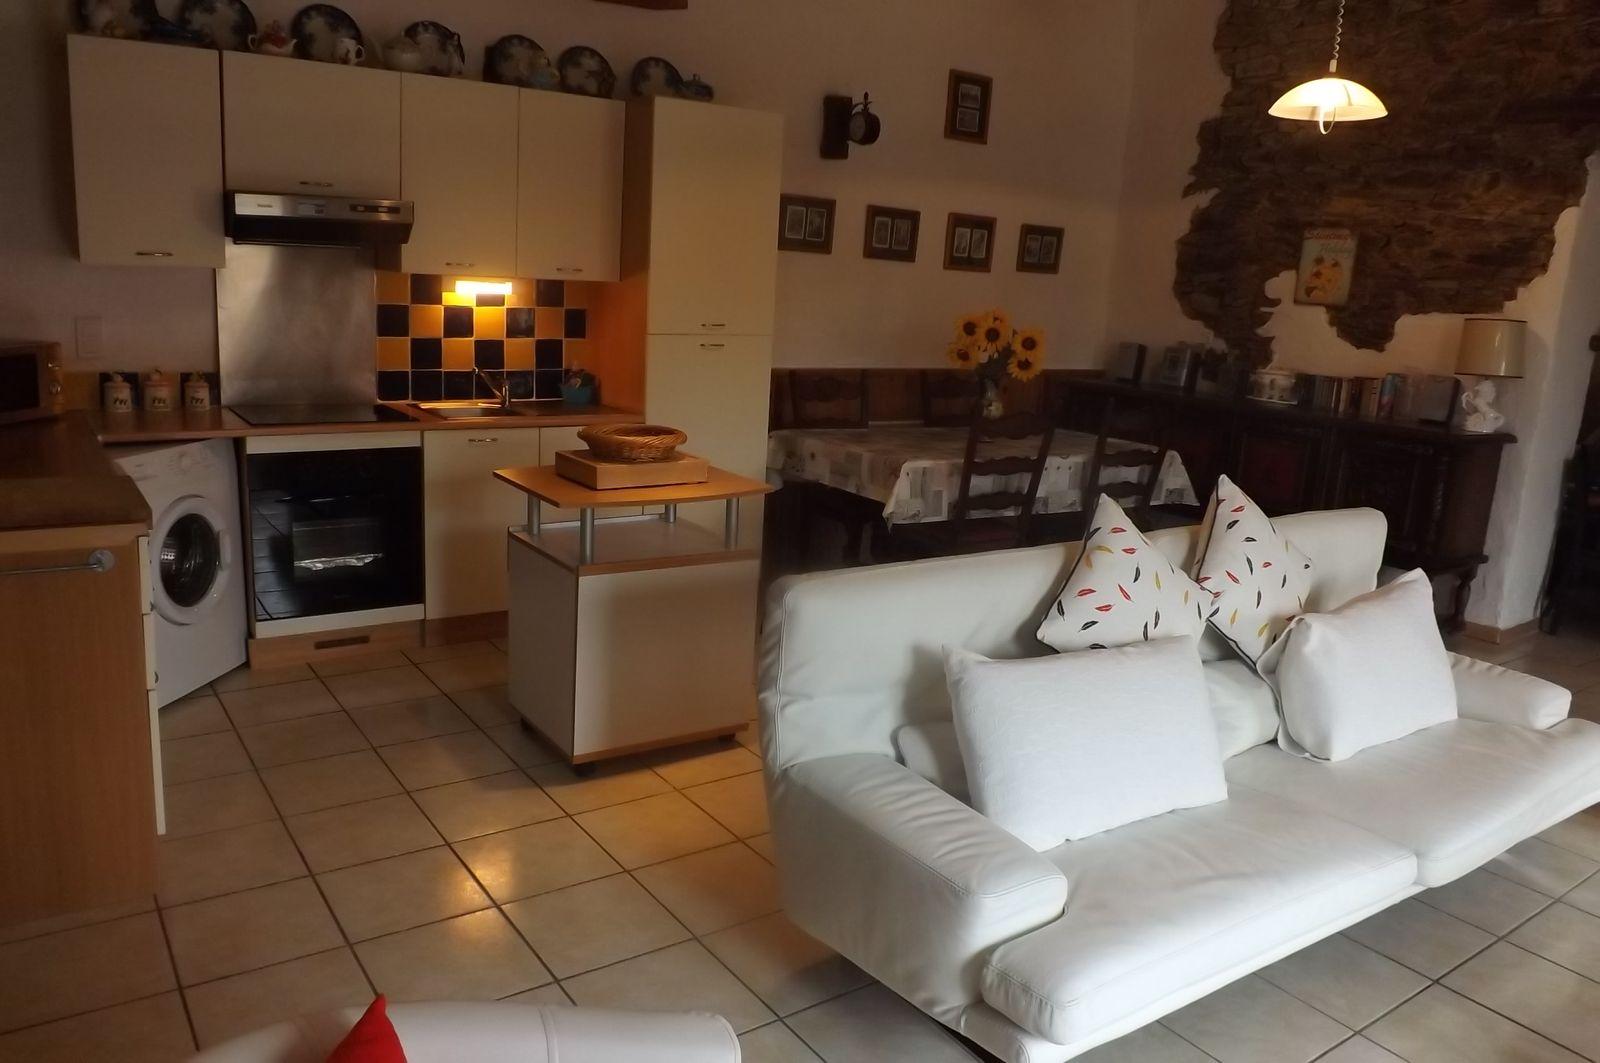 Cuisine - salon .Kitchen - Living room